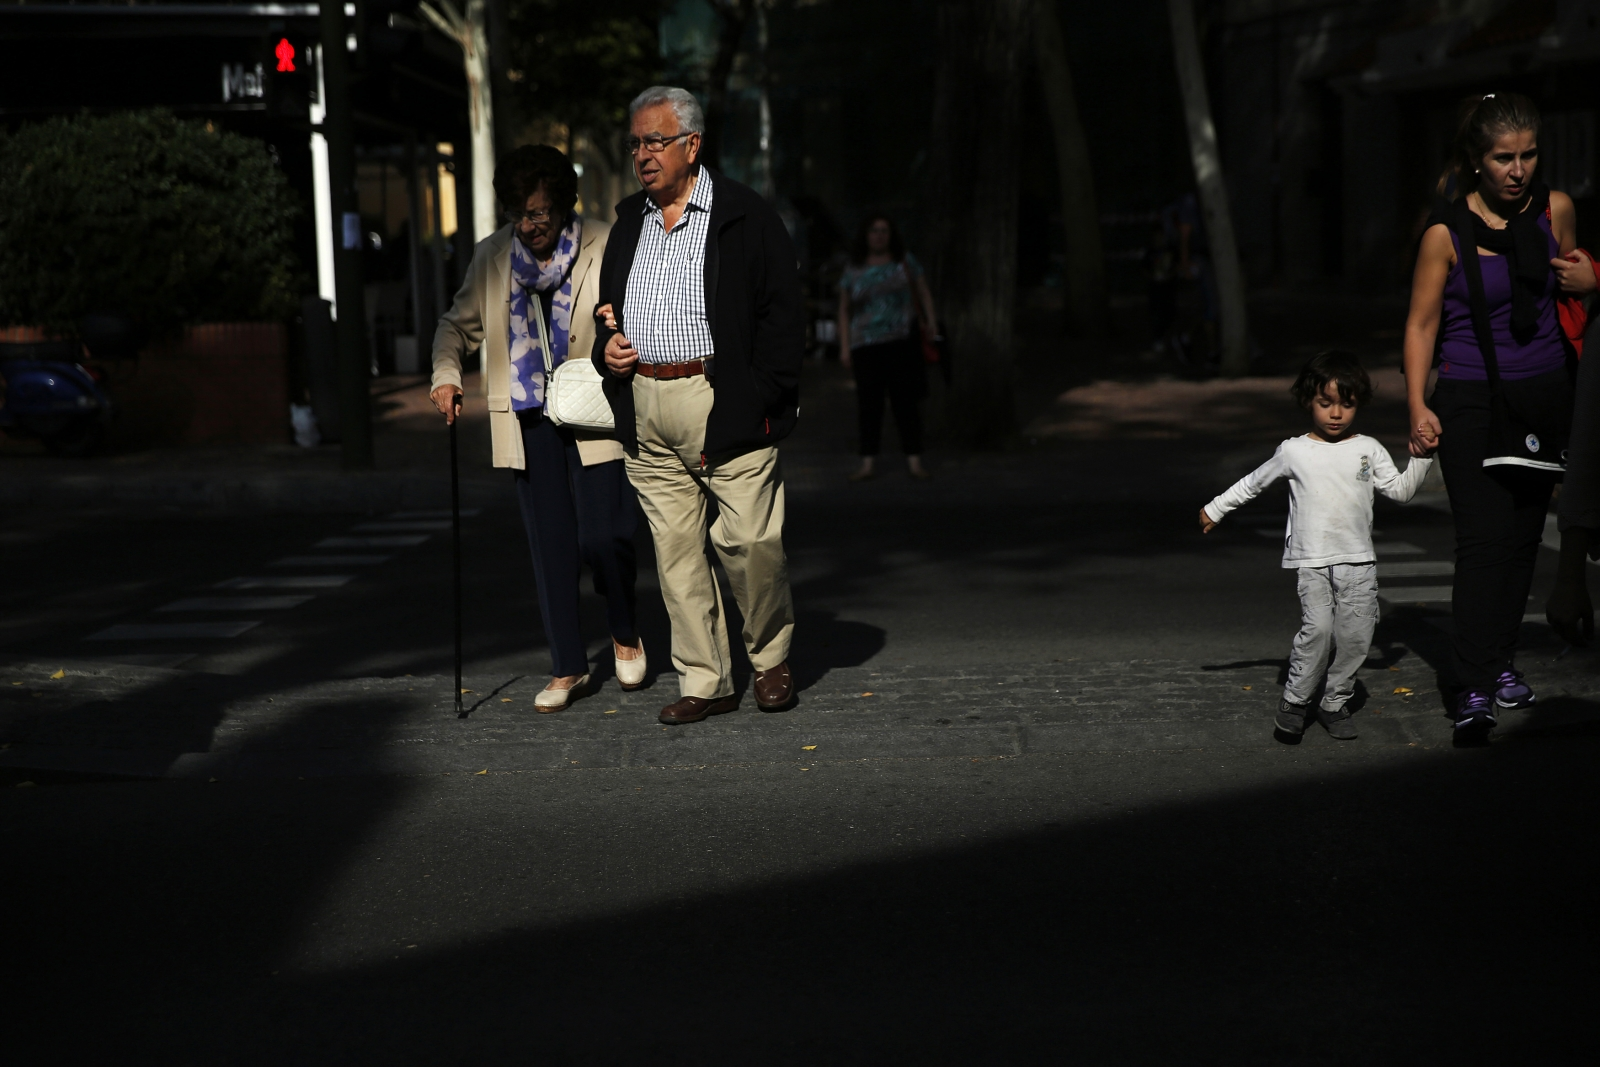 Pensioners cross the street in Madrid September 30, 2014.